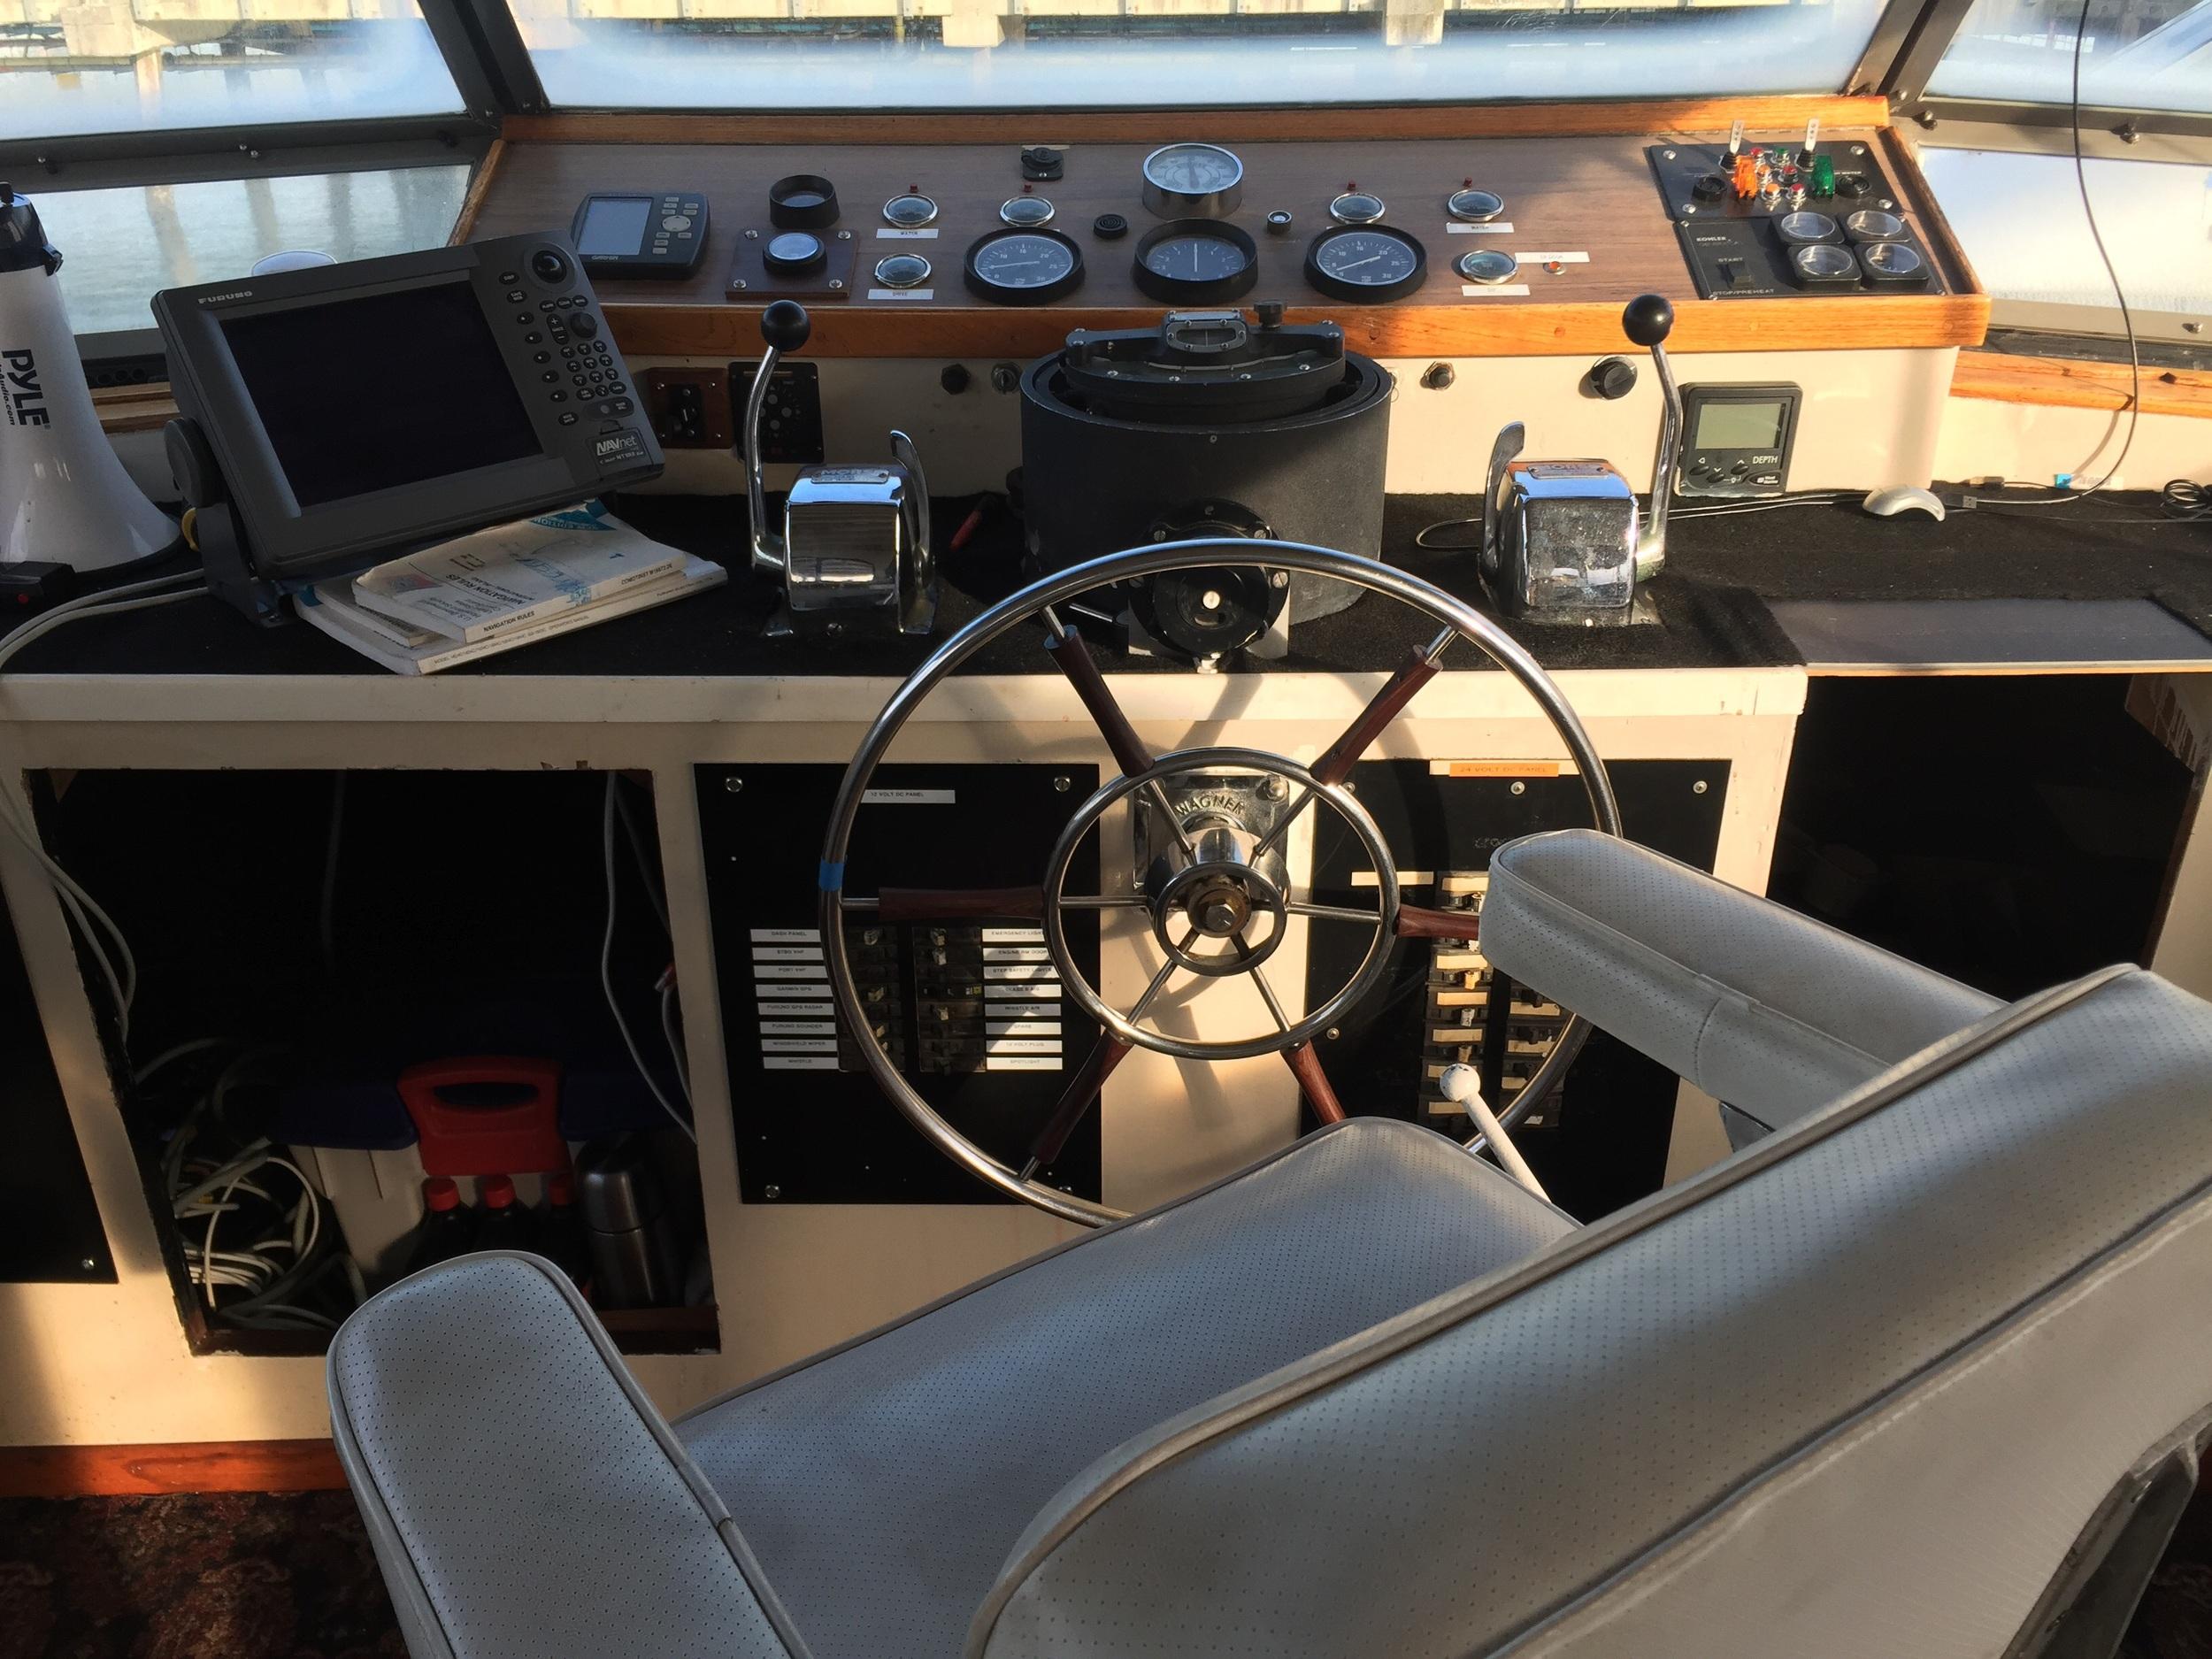 Captains control room